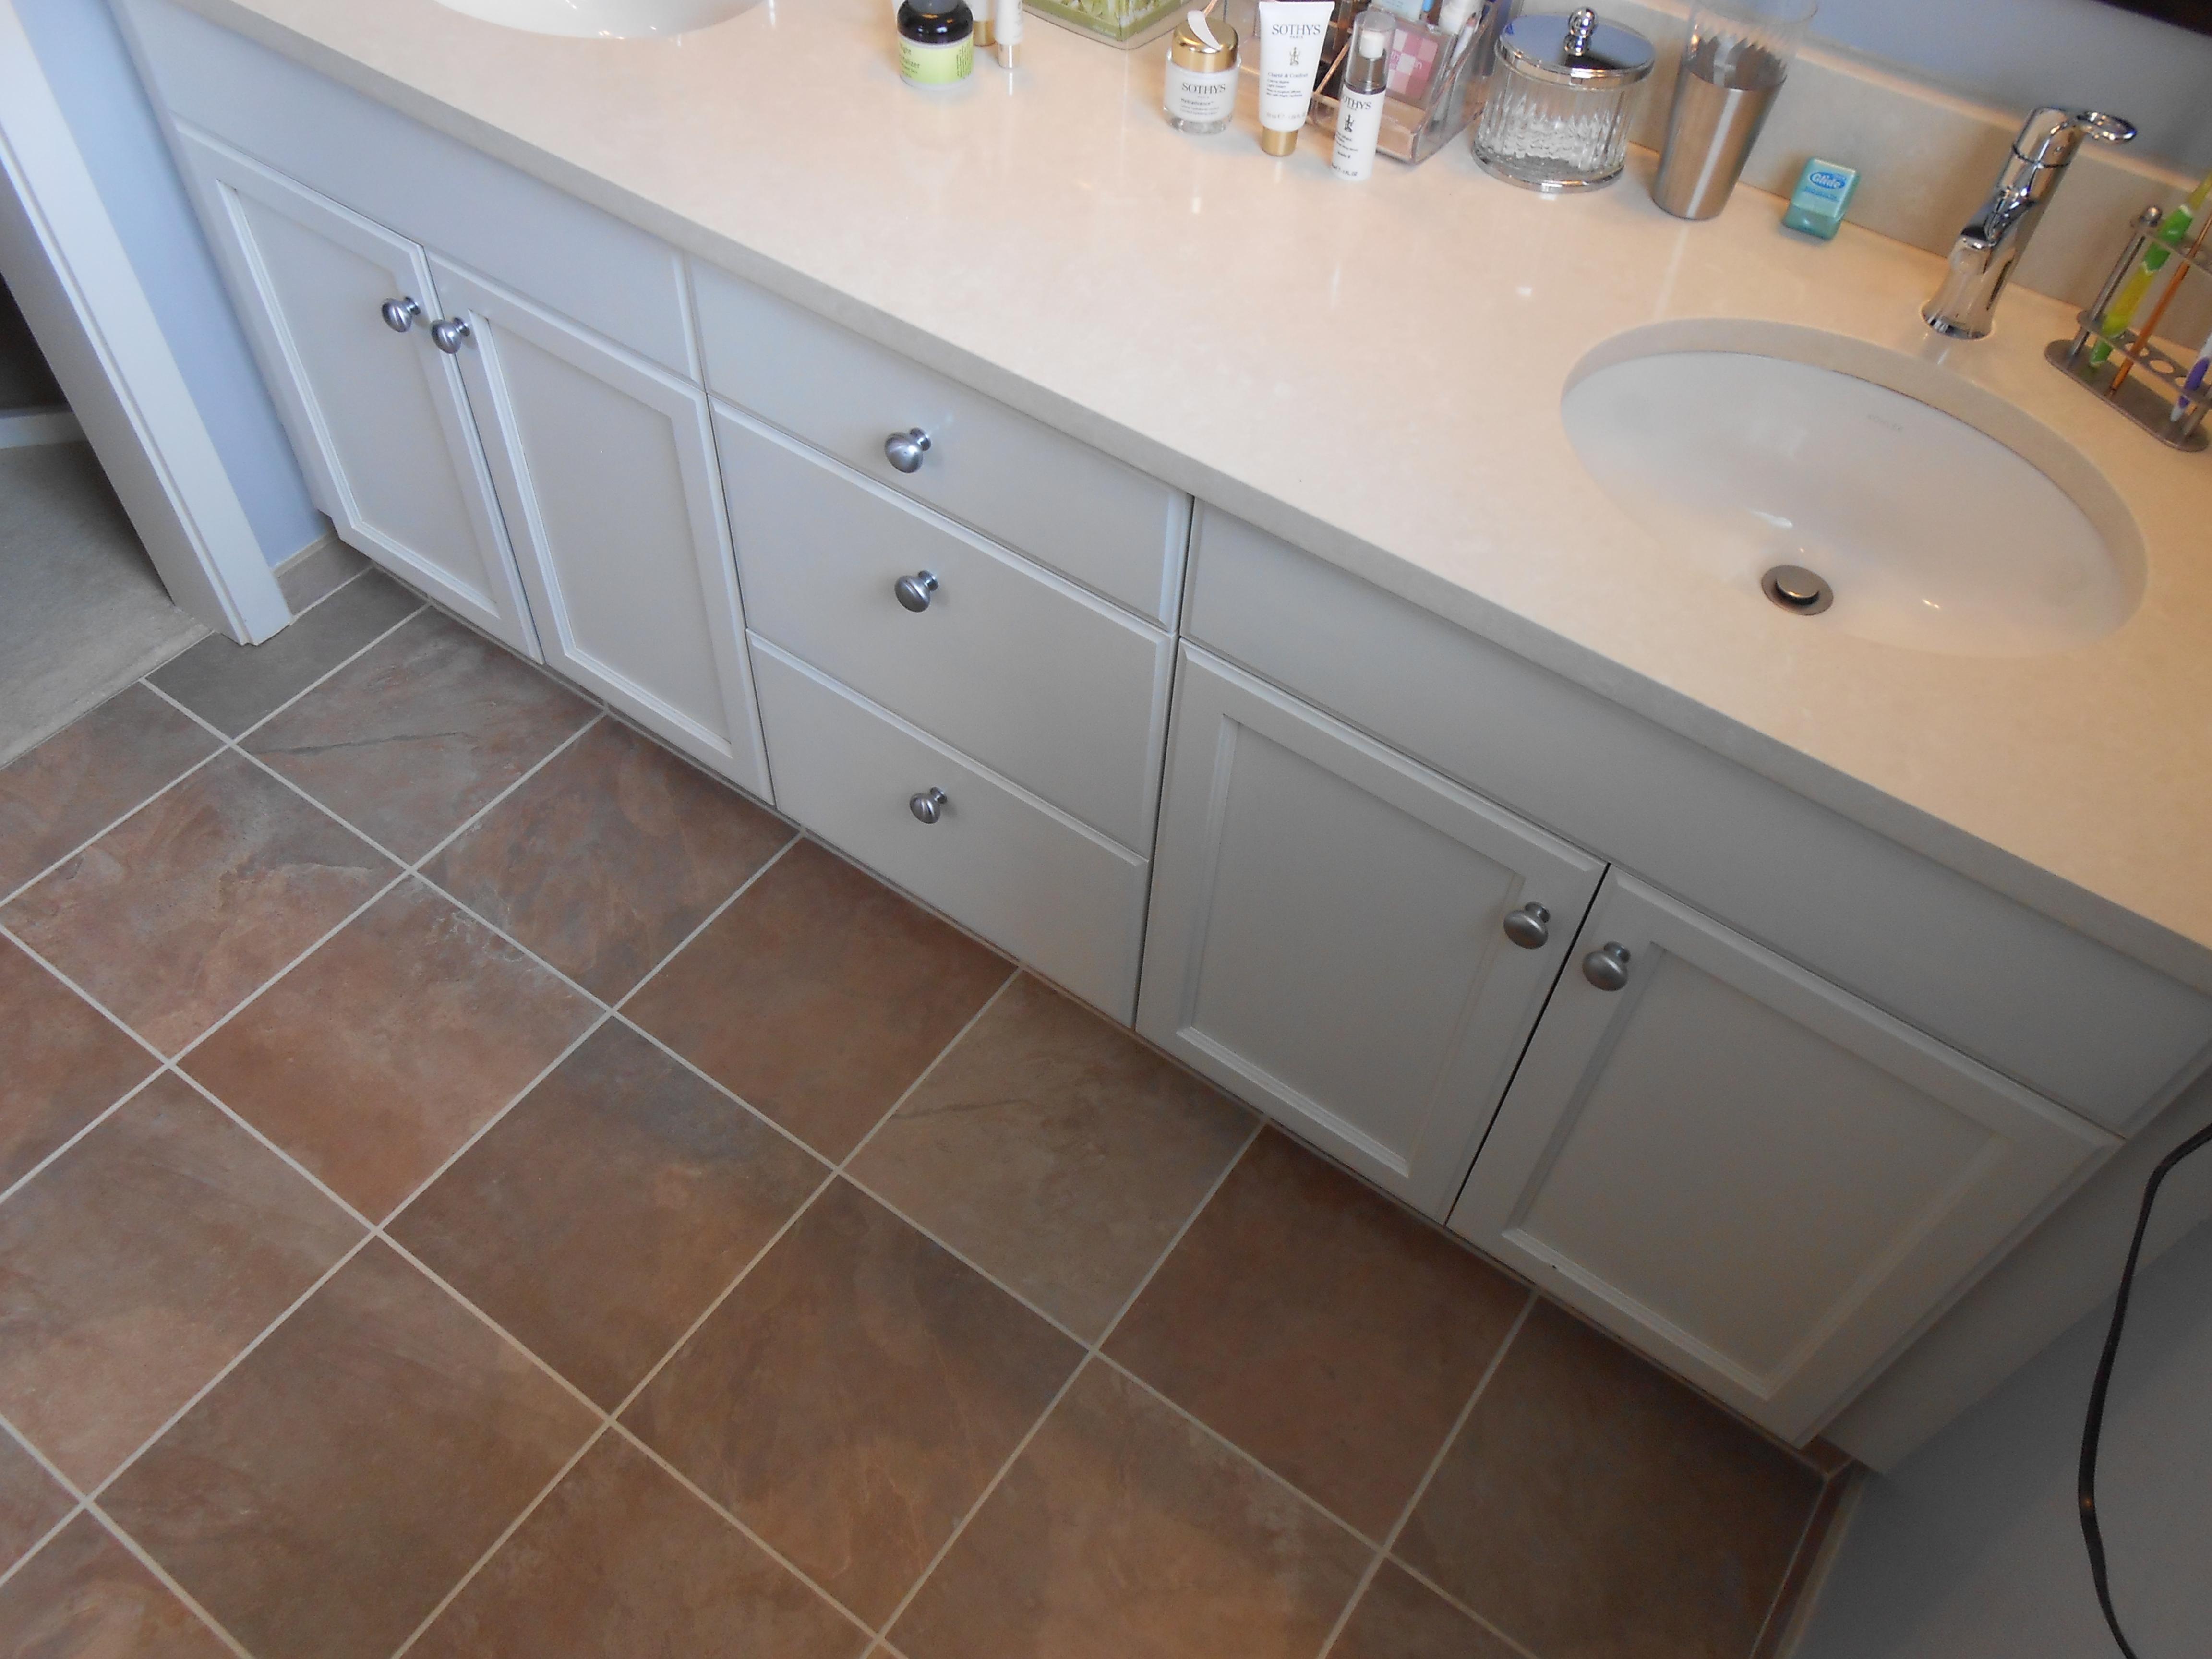 quartz slab countertop and heated tile floor in master bath